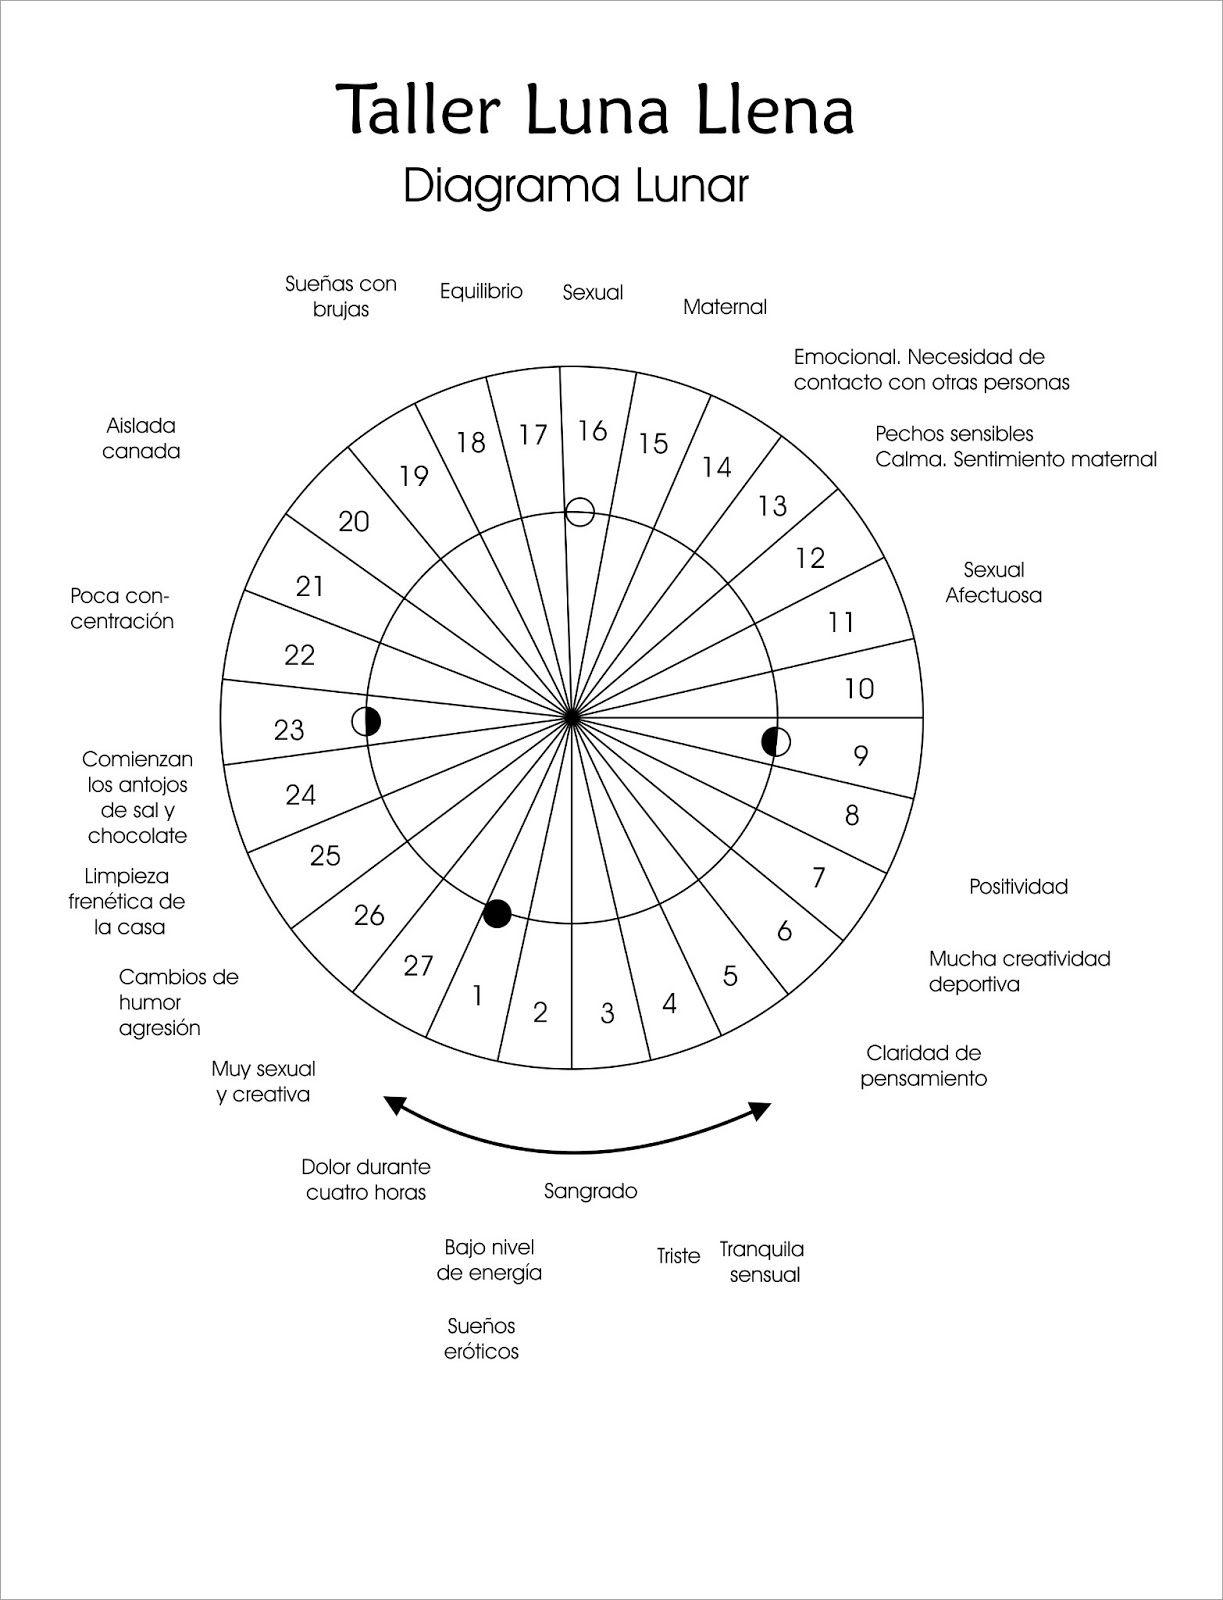 Diagrama lunar | Diagrama Lunar | Pinterest | Empoderamiento ...